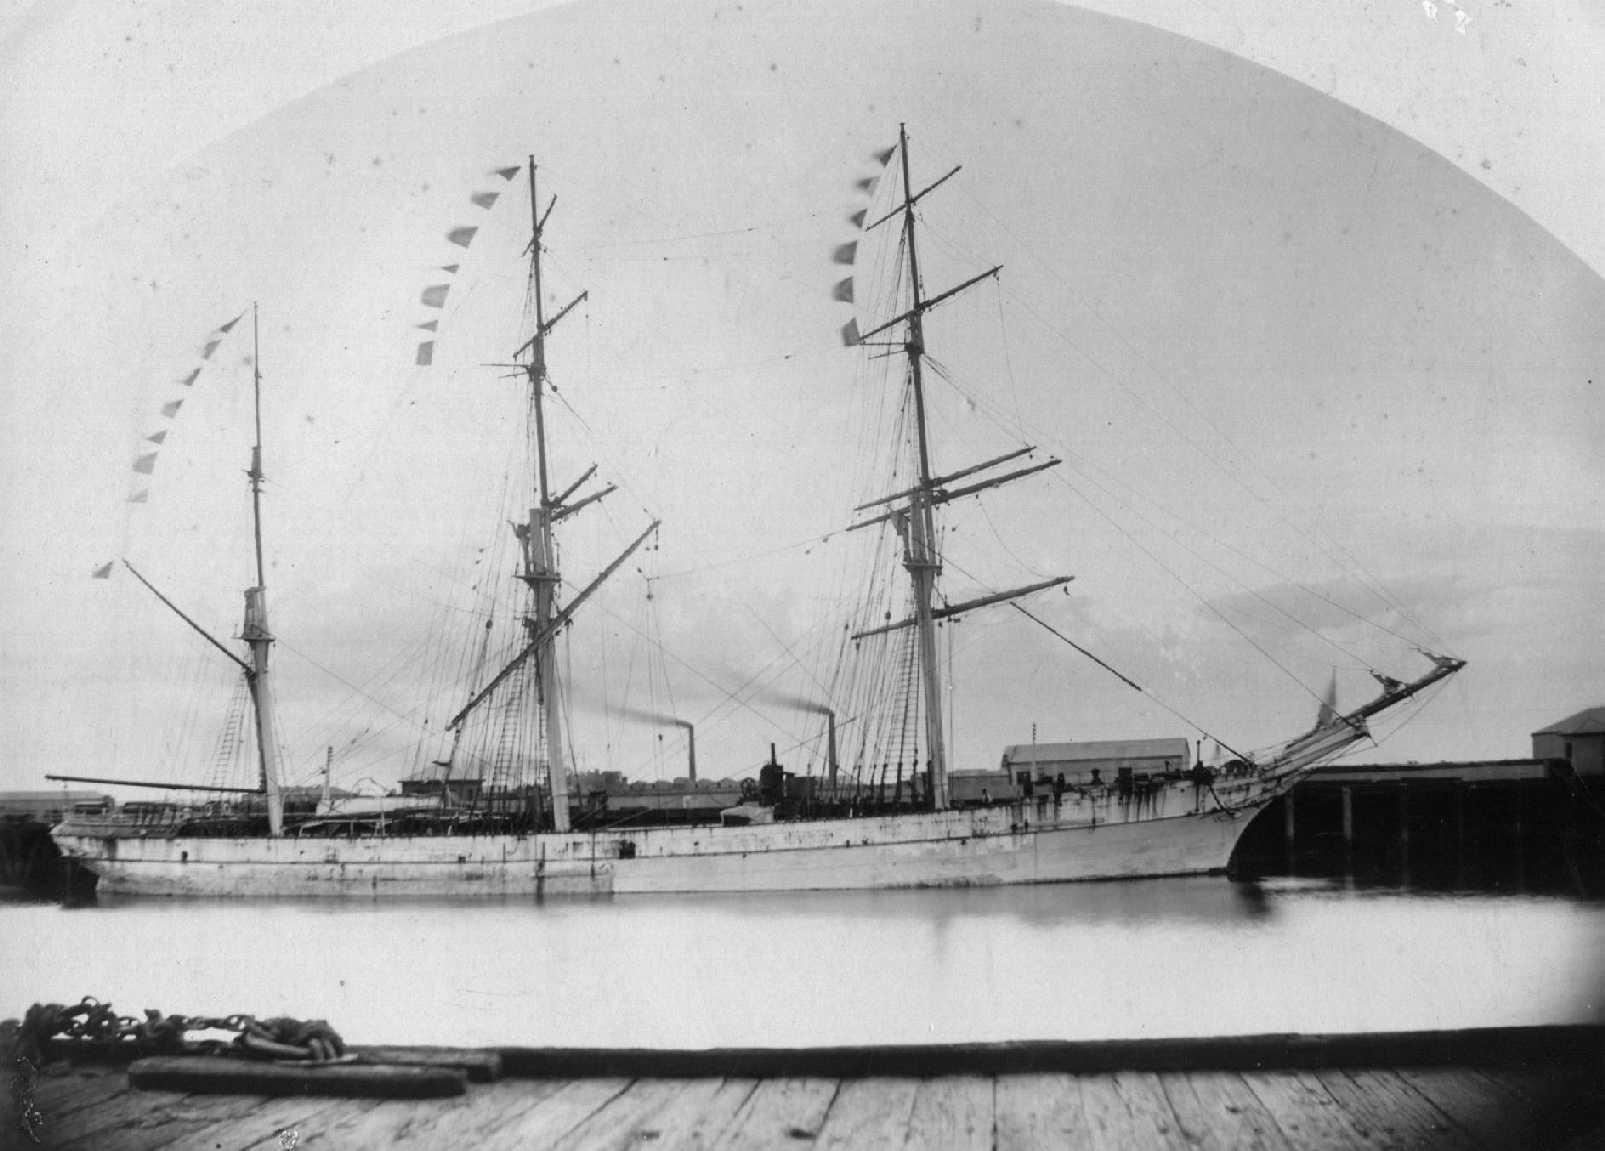 Image: Three masted composite ship